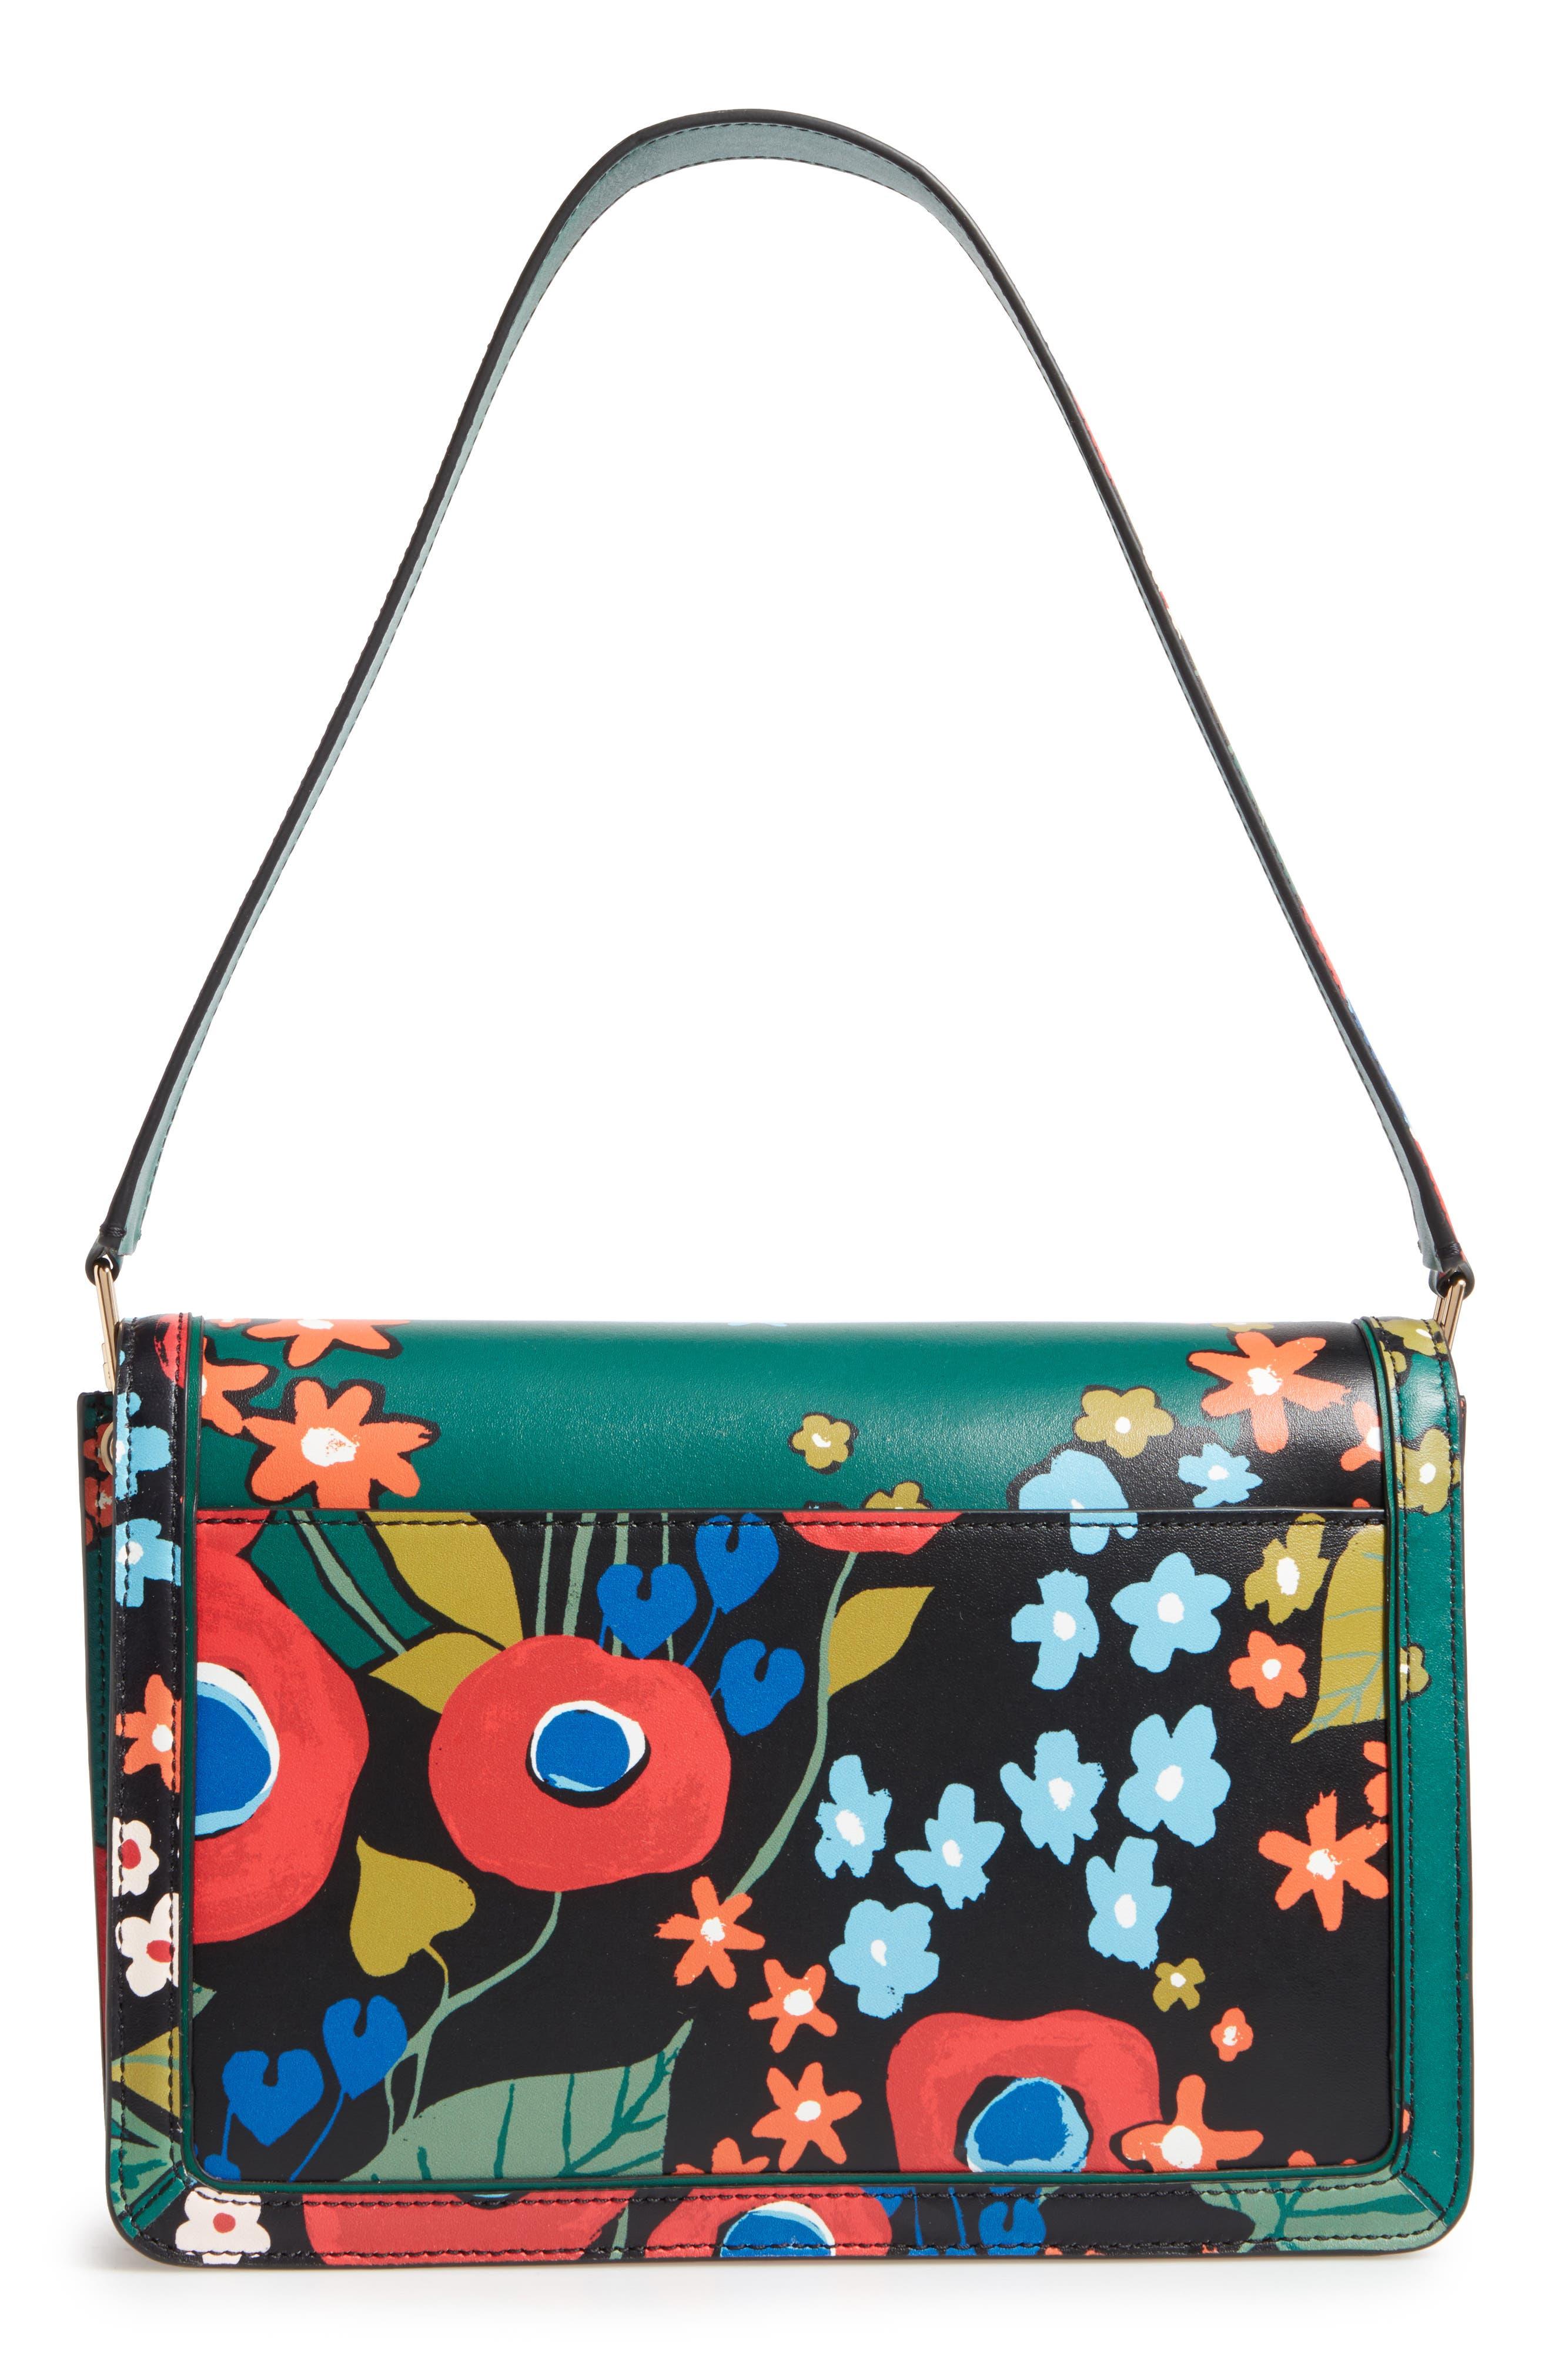 Juliette Flower Print Leather Shoulder Bag,                             Alternate thumbnail 3, color,                             300